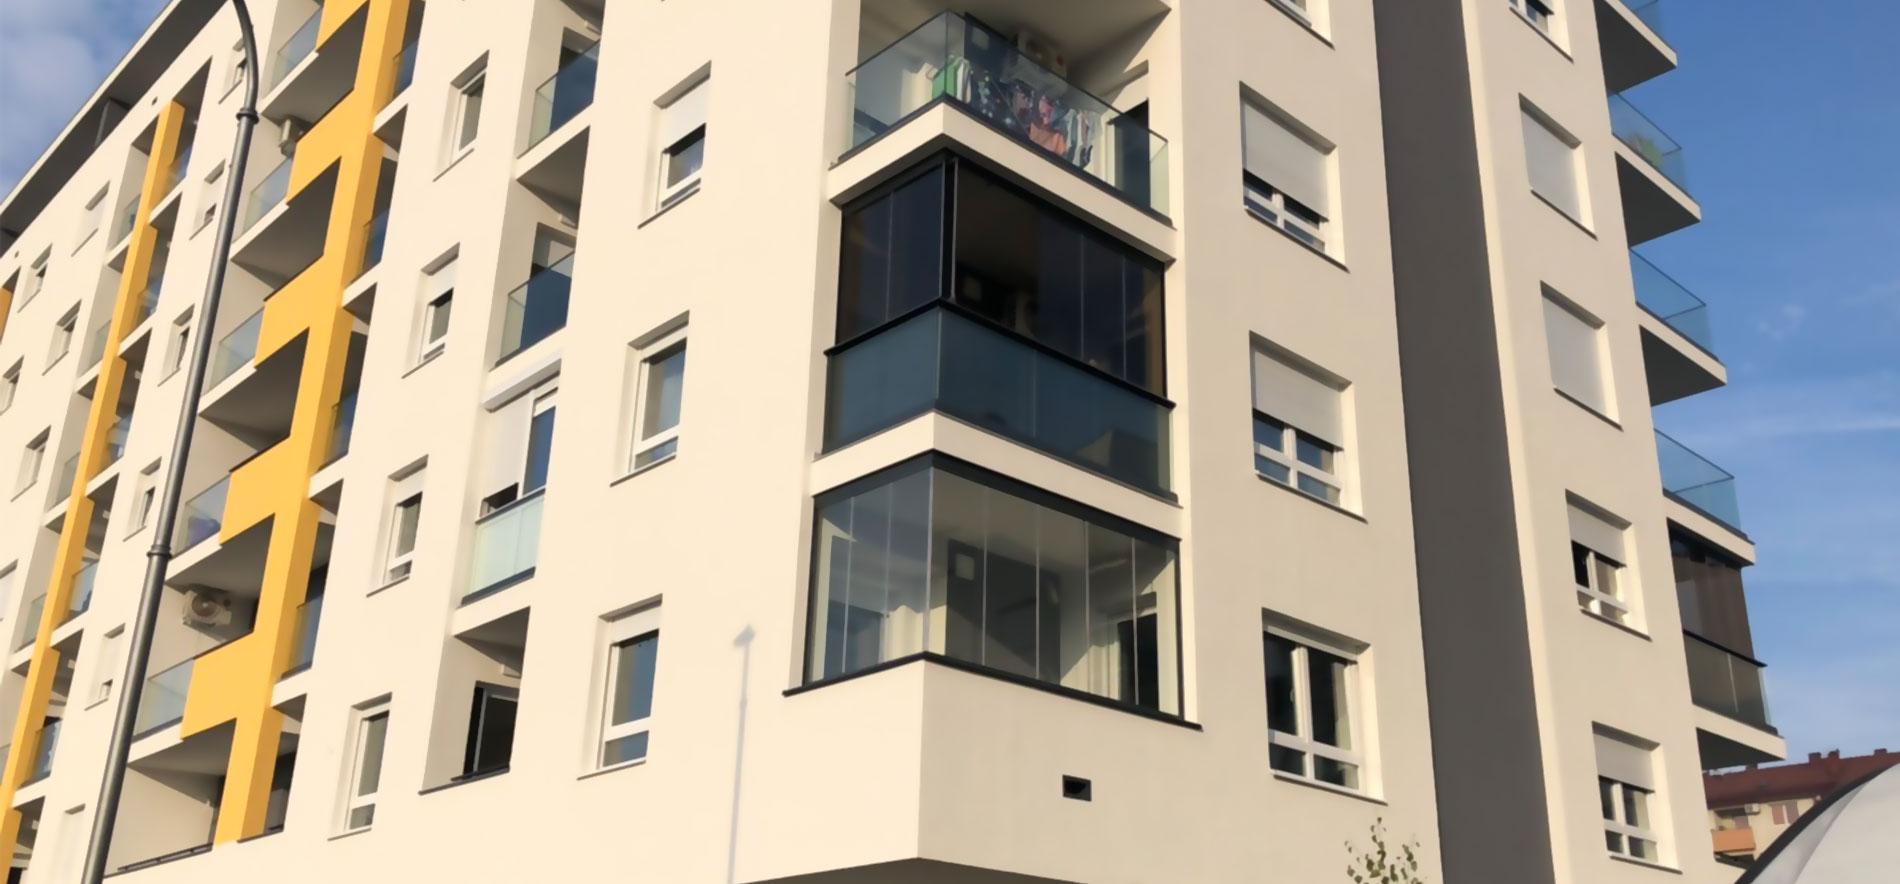 Stakleni balkoni - RMA Banja Luka